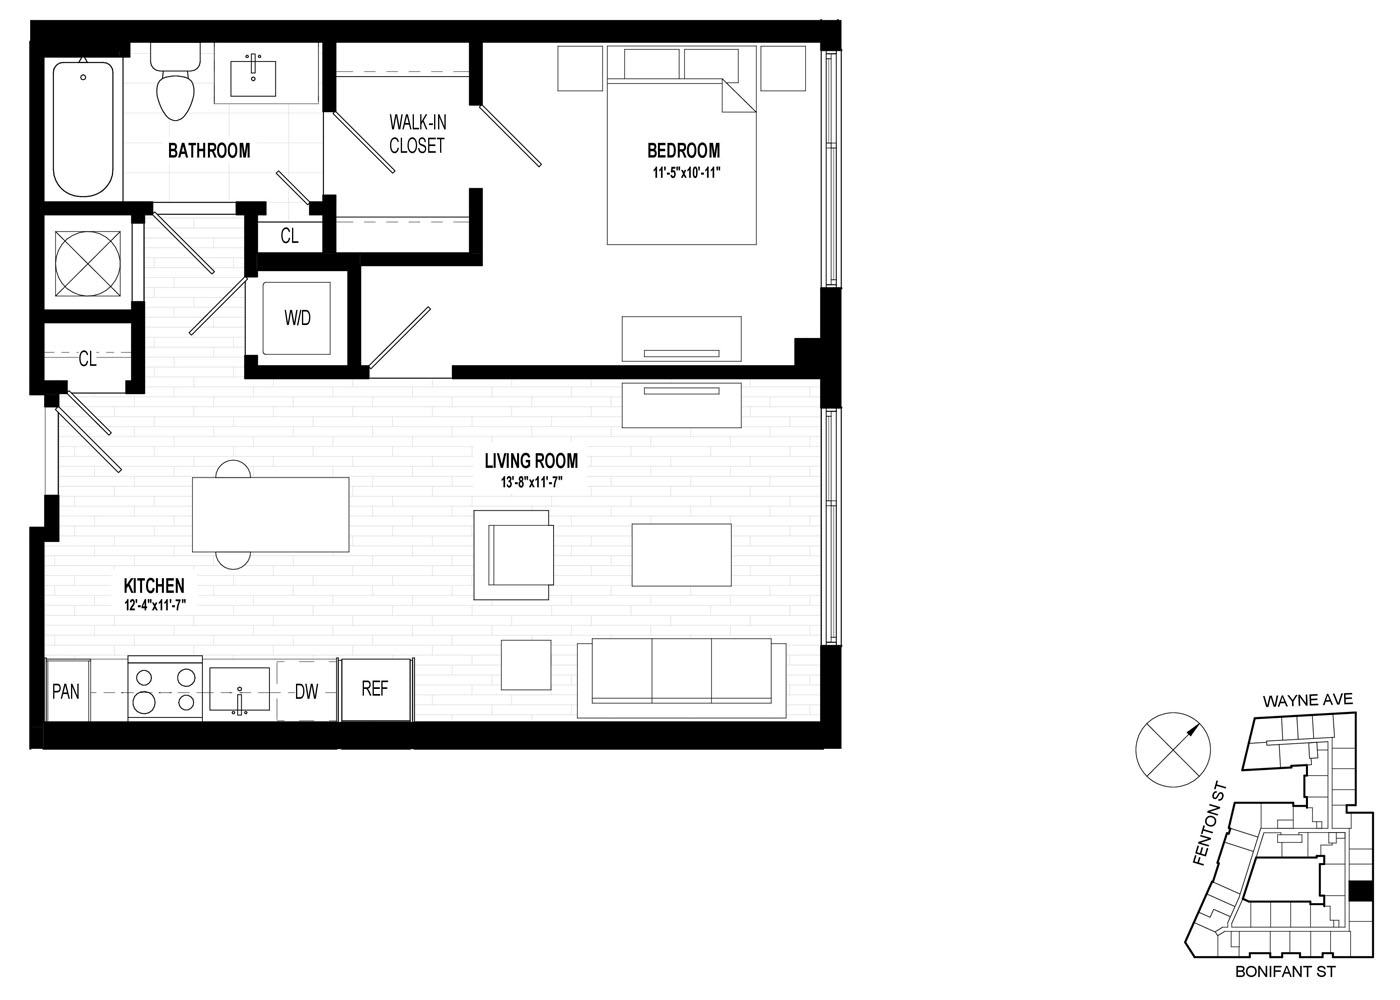 P0578887 761aa09 central a04a 638 2 floorplan